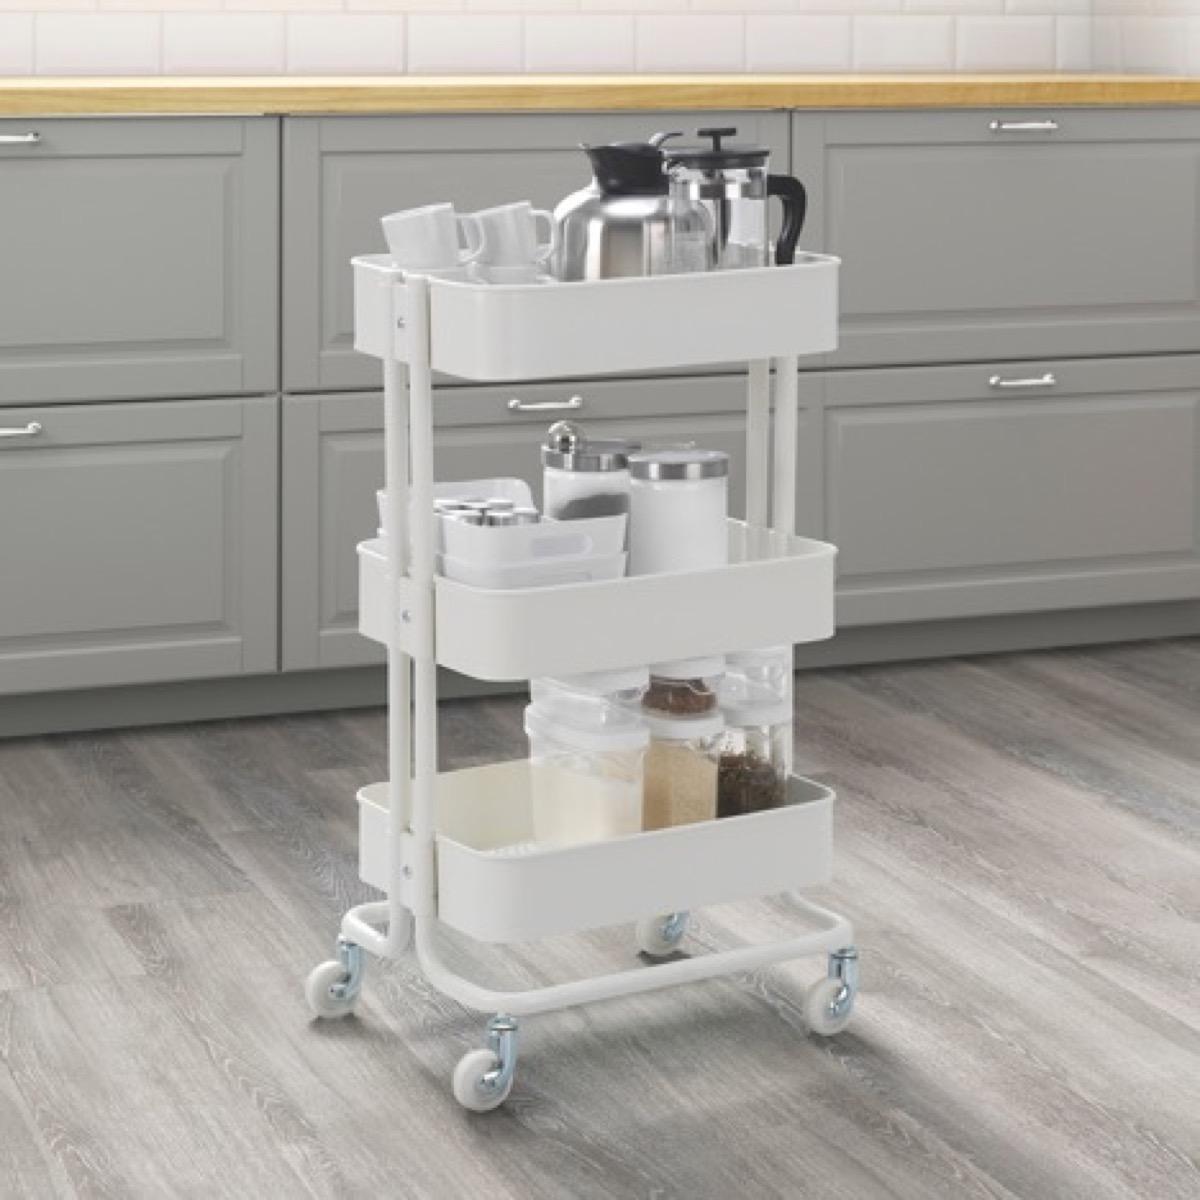 Ikea utility organizer in kitchen